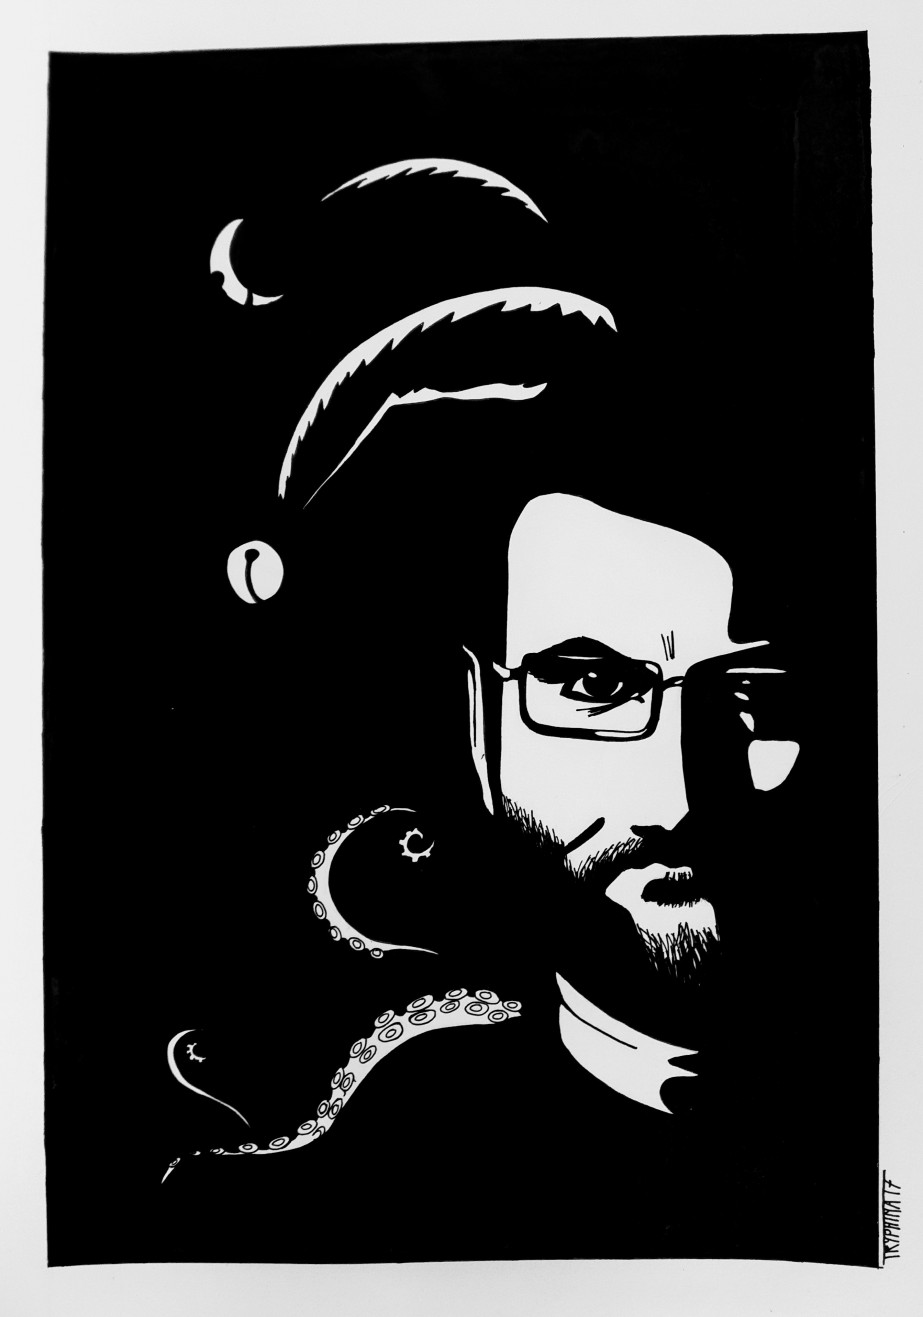 Portrait of harry hinterbuchinger as a dark jester.